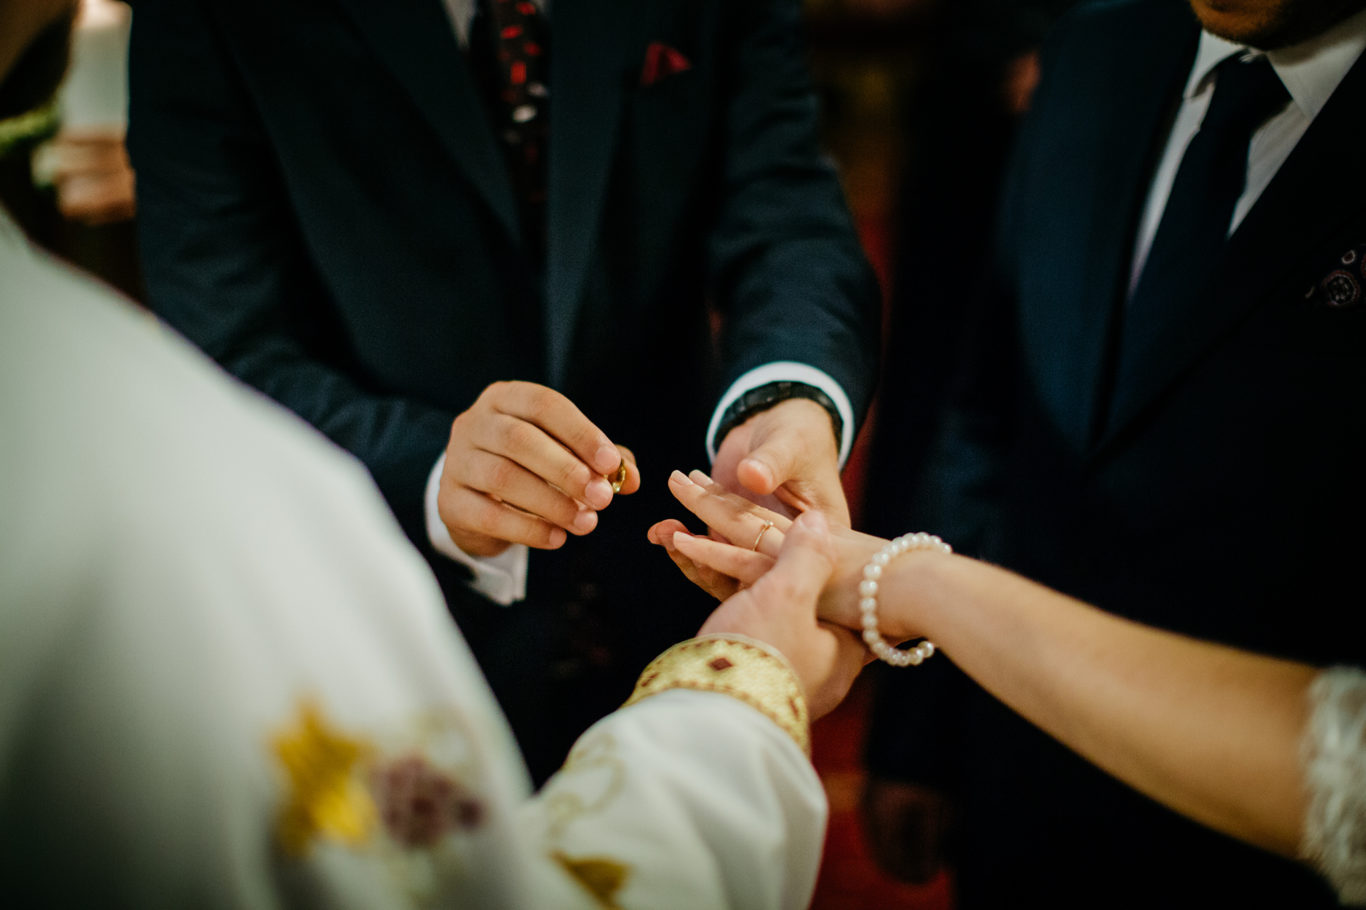 0390-fotografie-nunta-bucuresti-anca-george-fotograf-ciprian-dumitrescu-dcf_4931